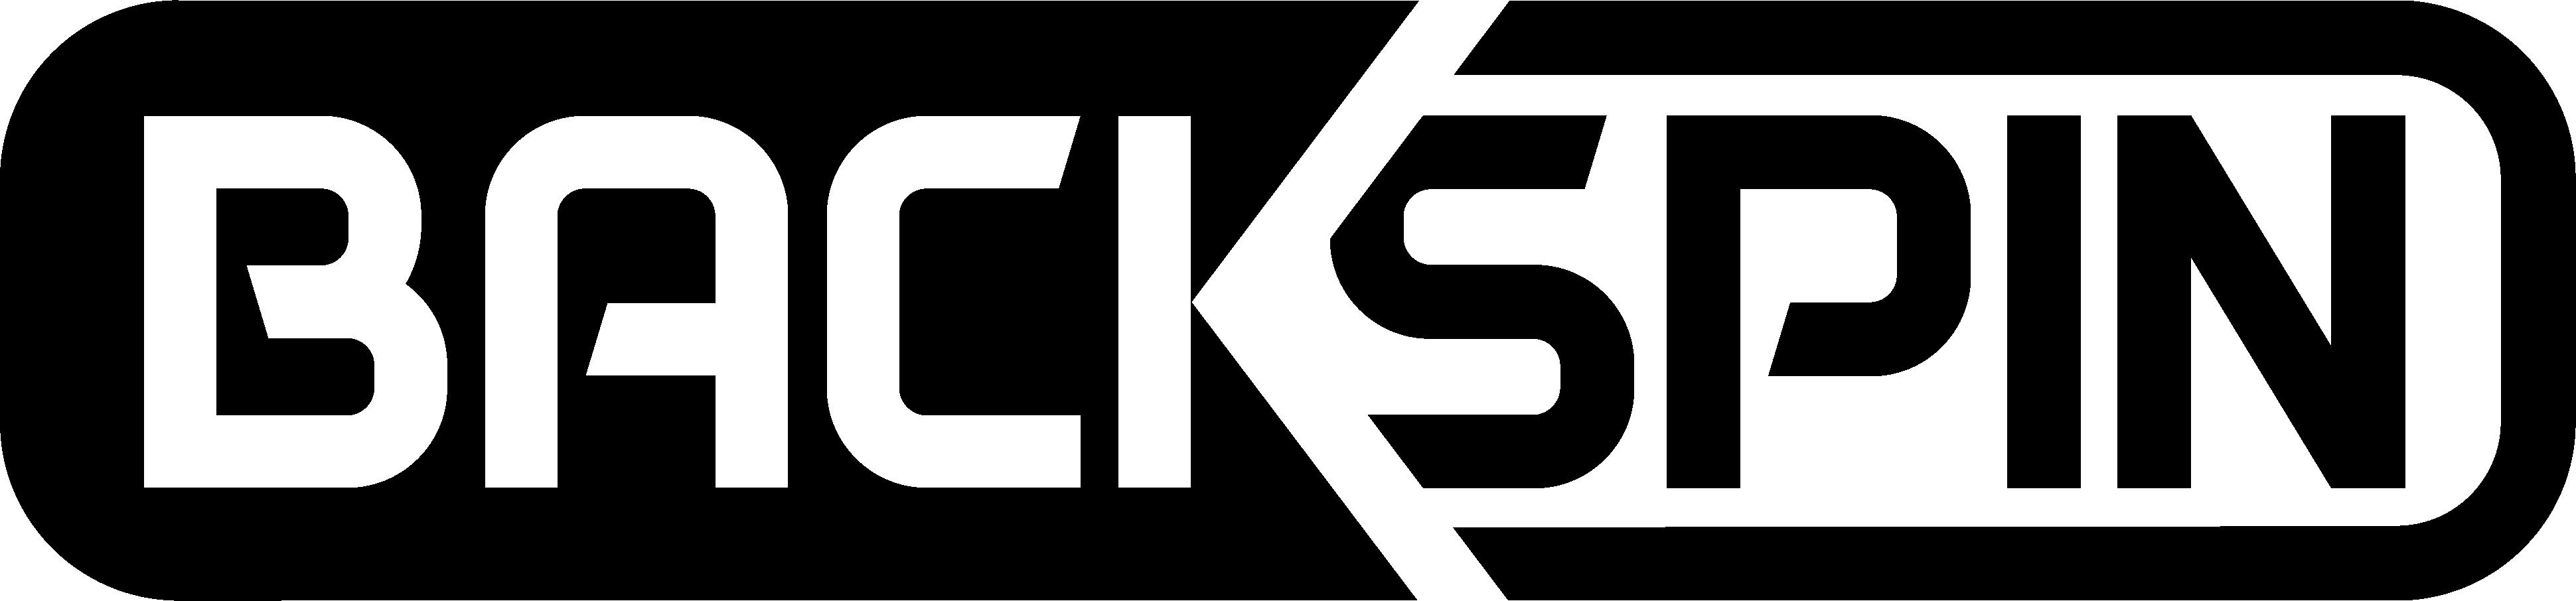 BackSpin_Logo_Black-1